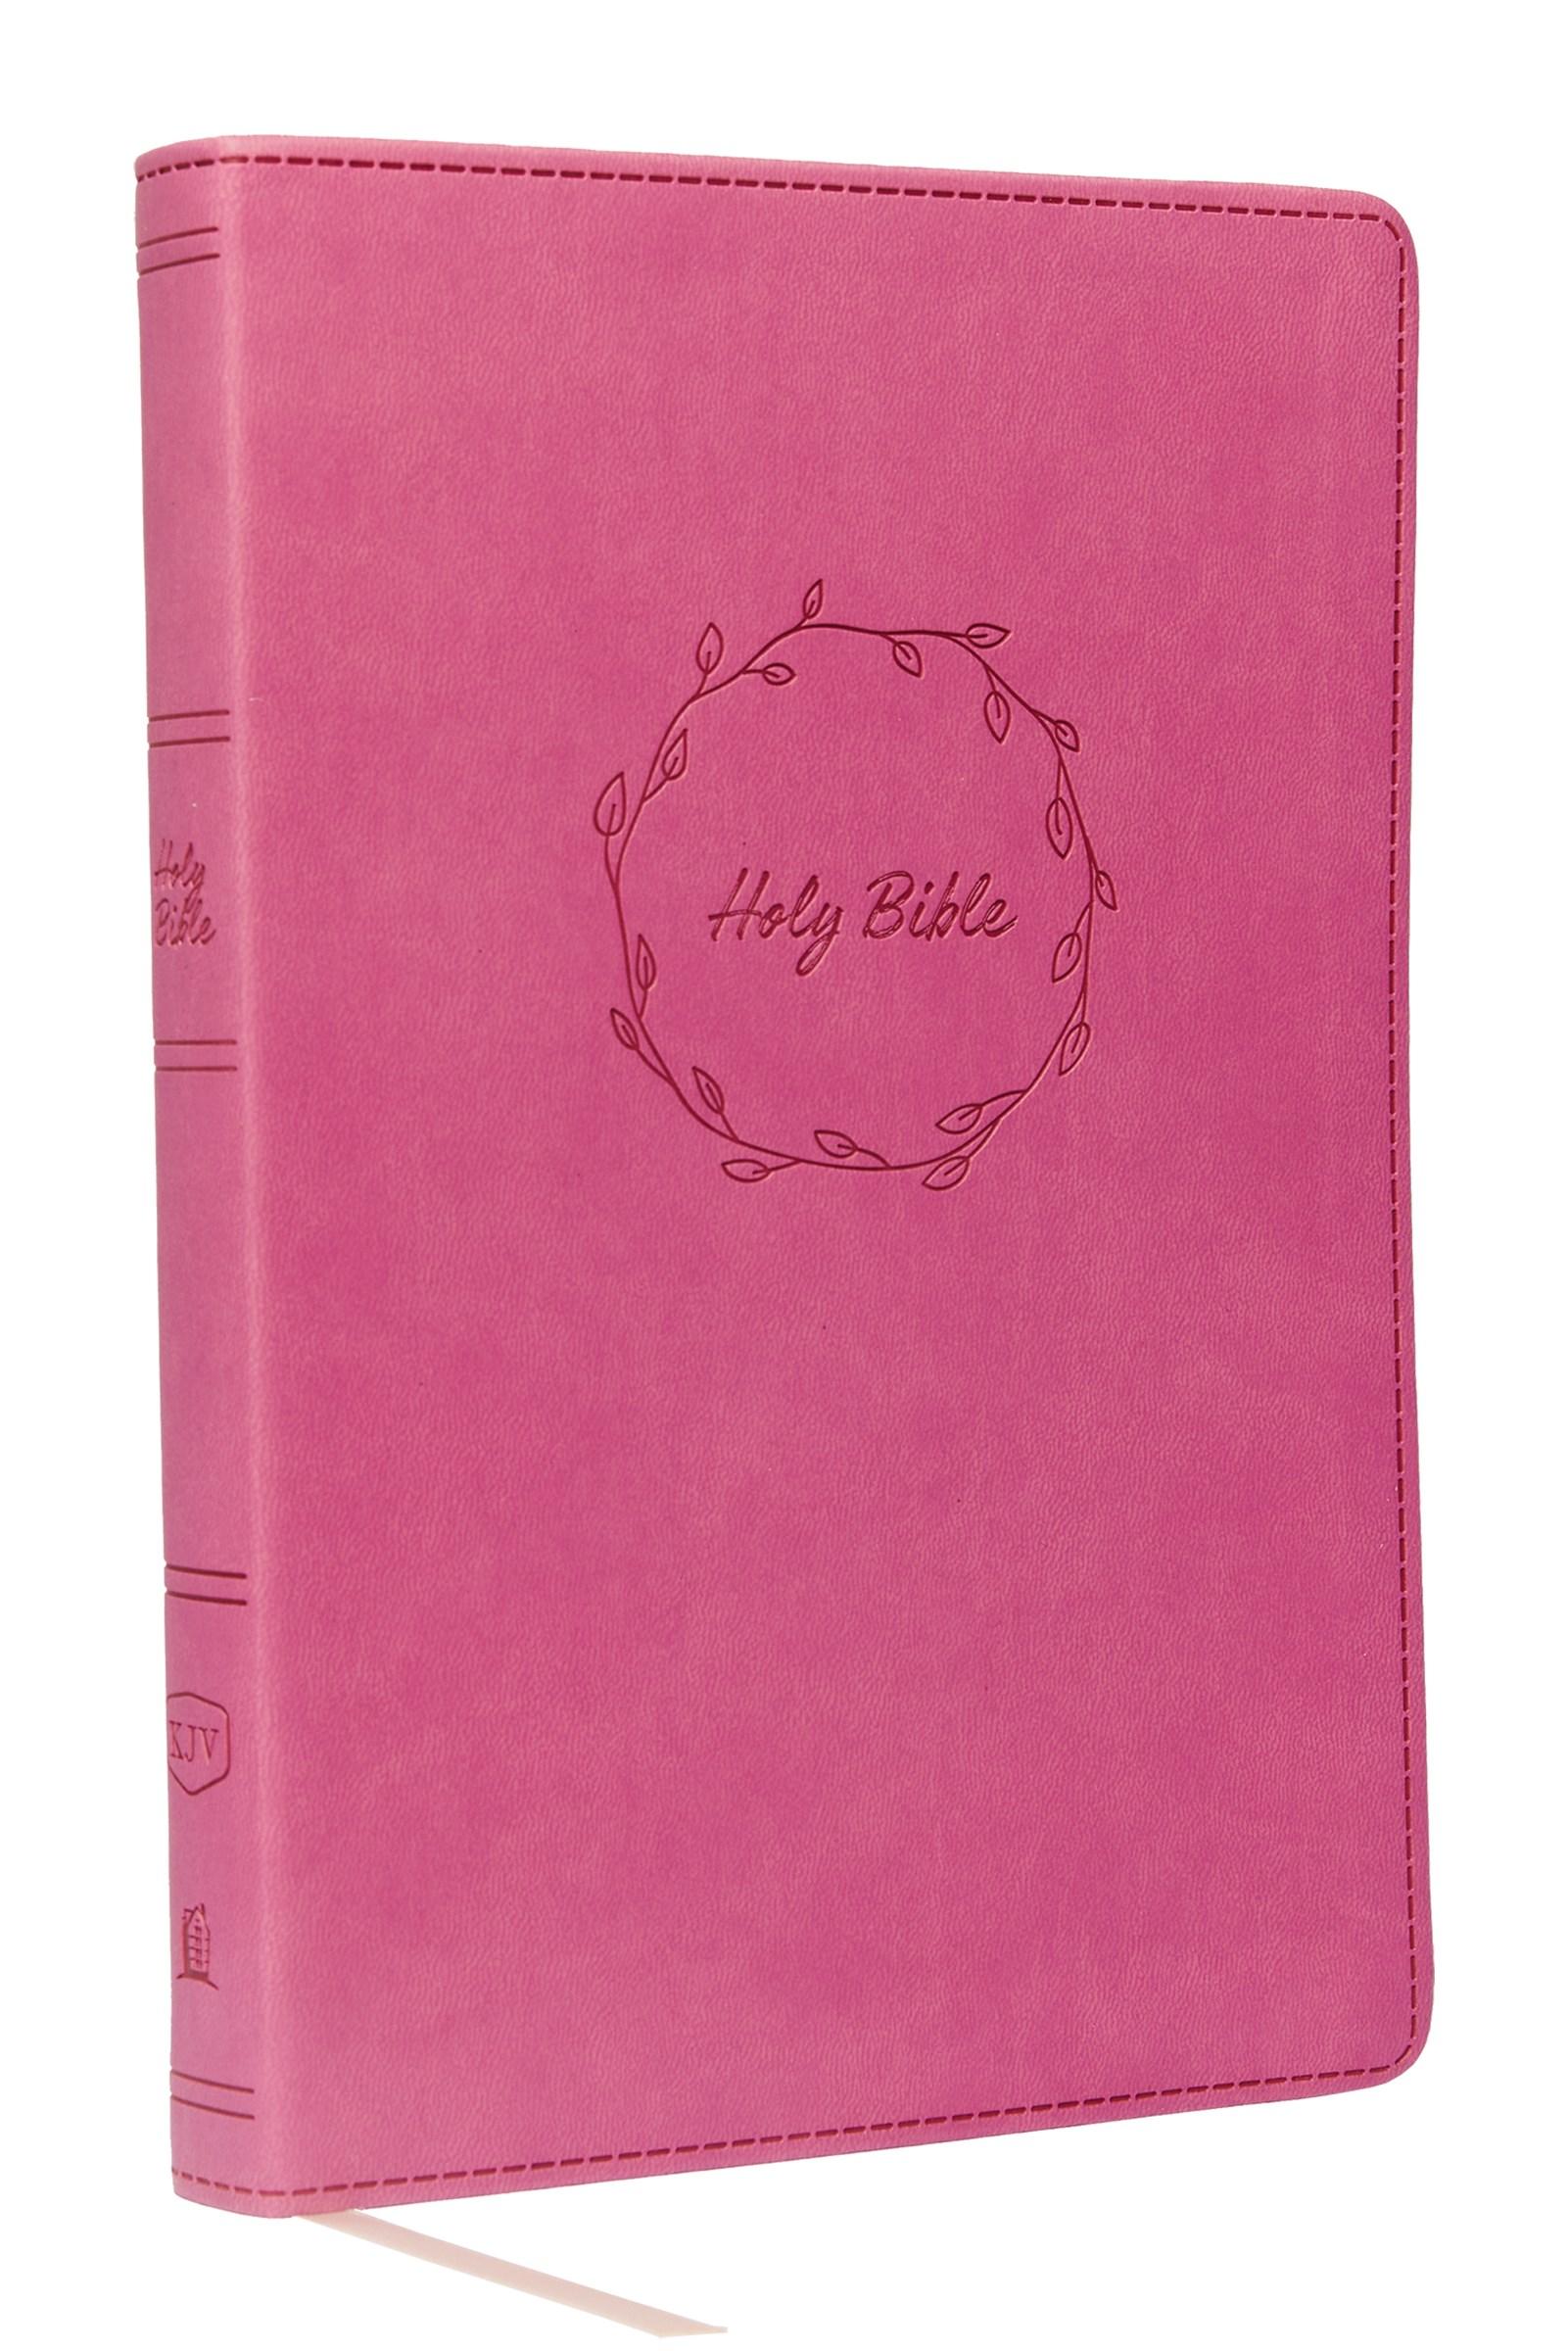 KJV Value Thinline Bible/Large Print (Comfort Print)-Pink Leathersoft